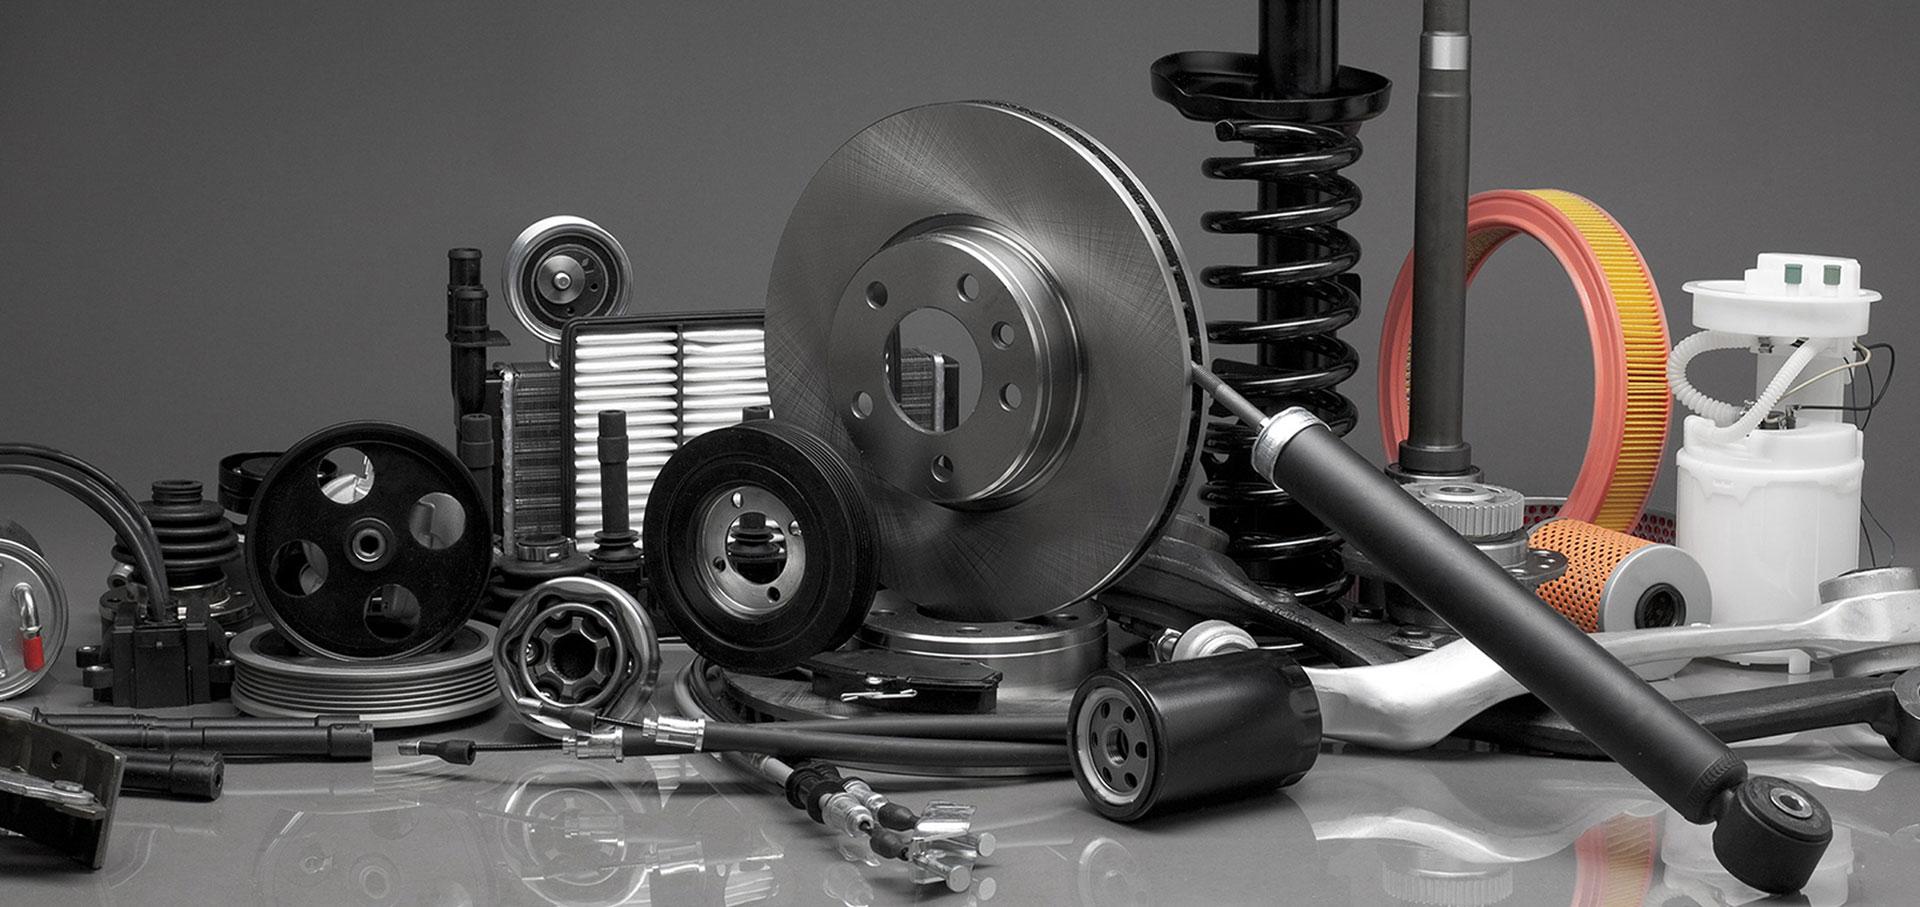 Auto Motor Parts : Genuine used parts auto spares sydney just commercials